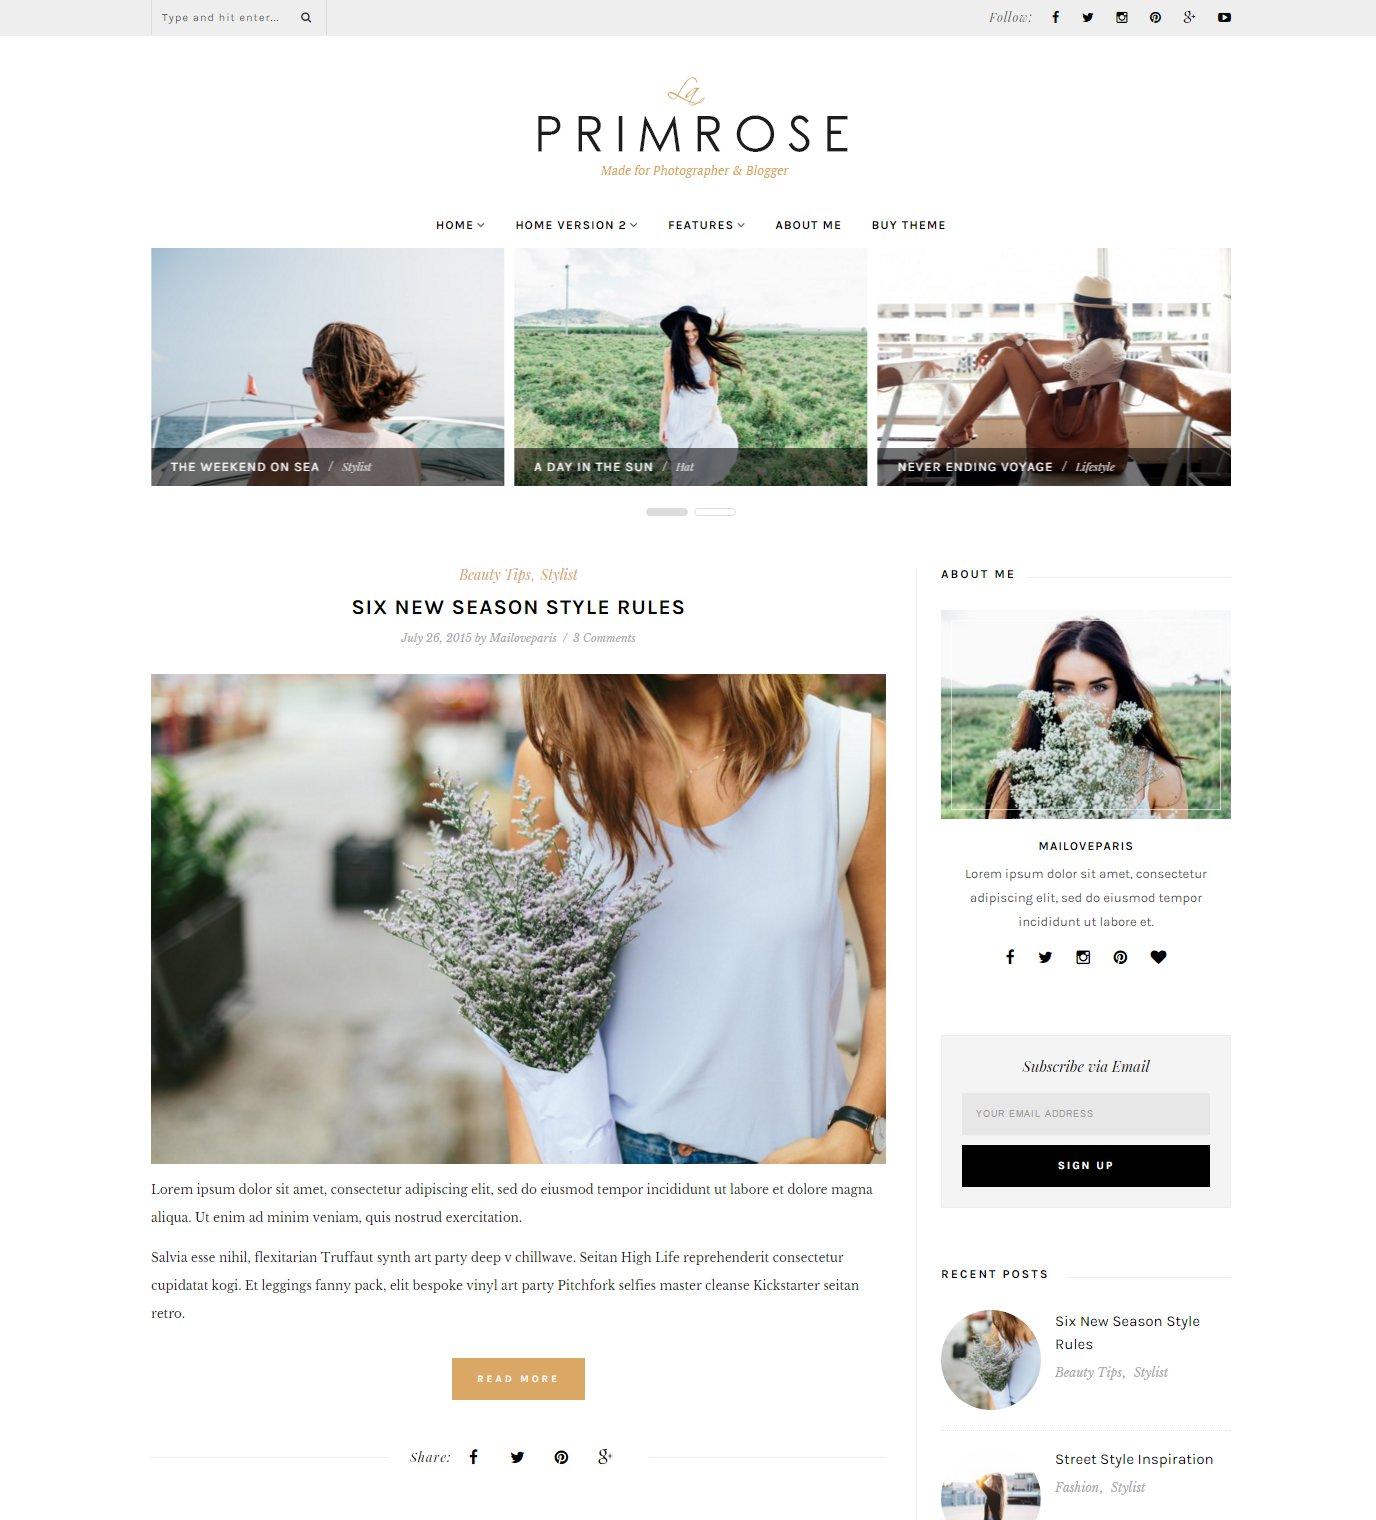 La primrose wordpress blog theme wordpress blog themes for Word press blog templates